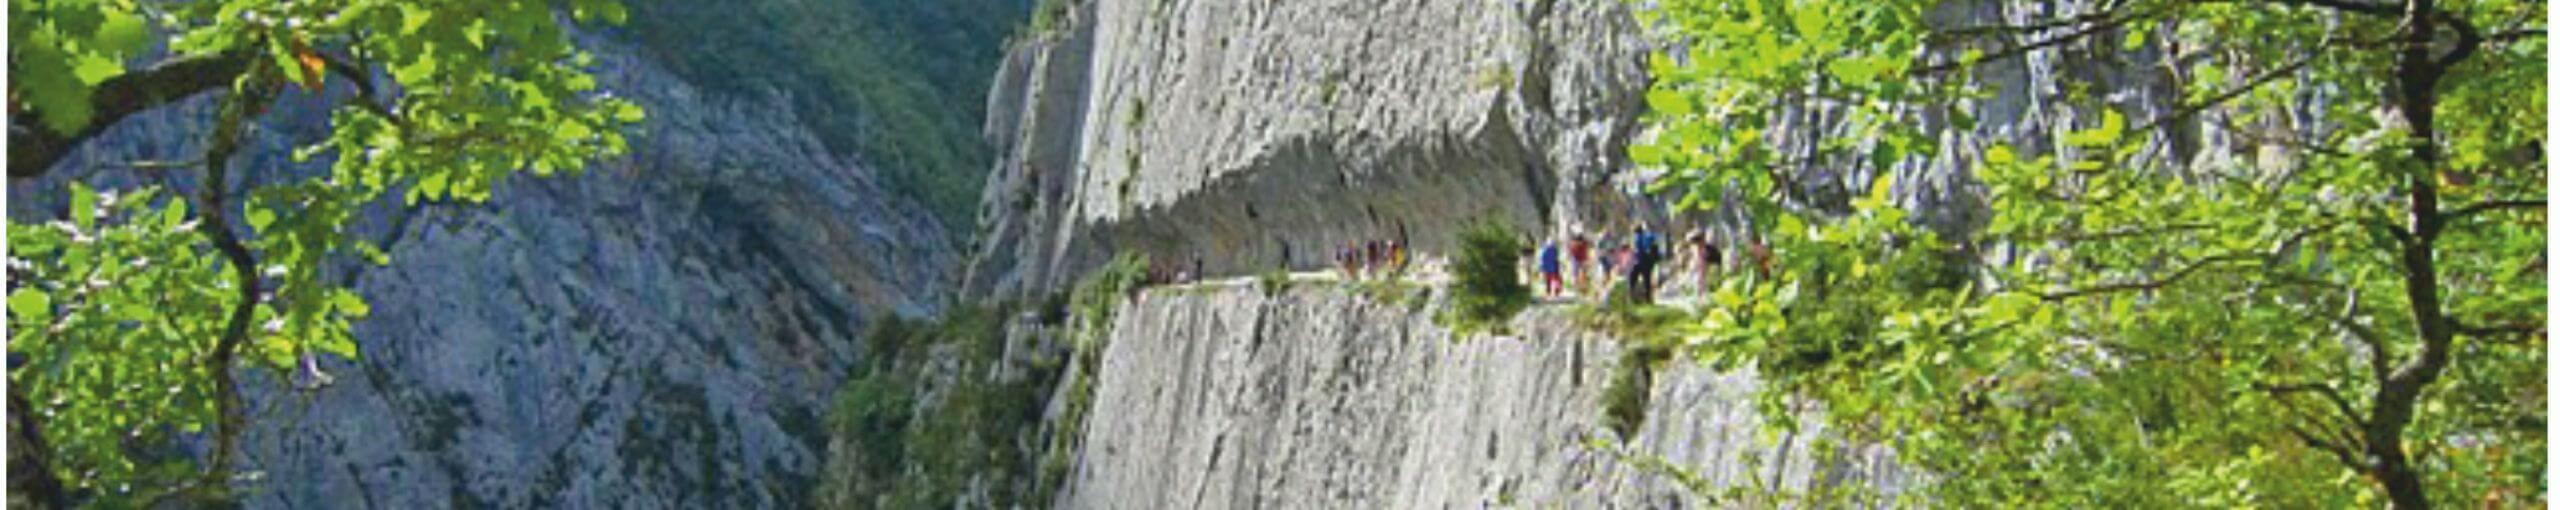 Chemin de la Mâture. Valle de Aspe. Etsaut. Pirineos Atlánticos. Nueva Aquitania. Francia.